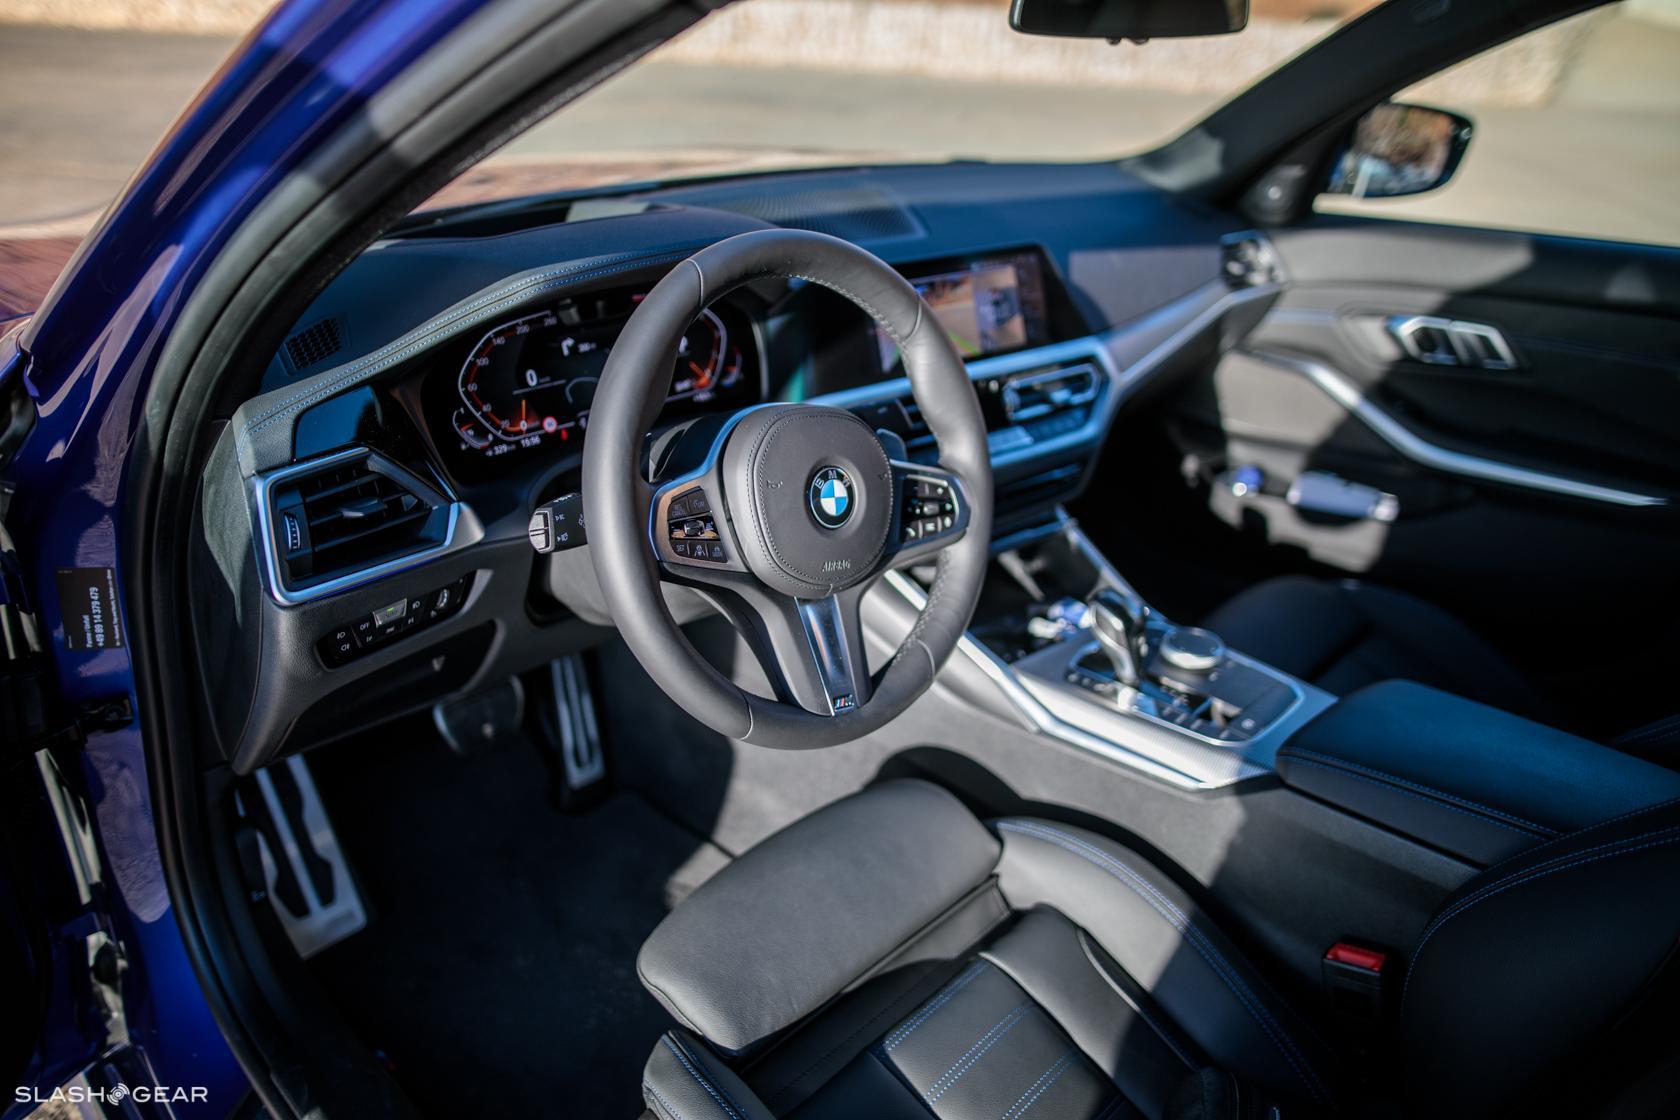 2019 Bmw 330i And 2020 M340i First Drive Slashgear